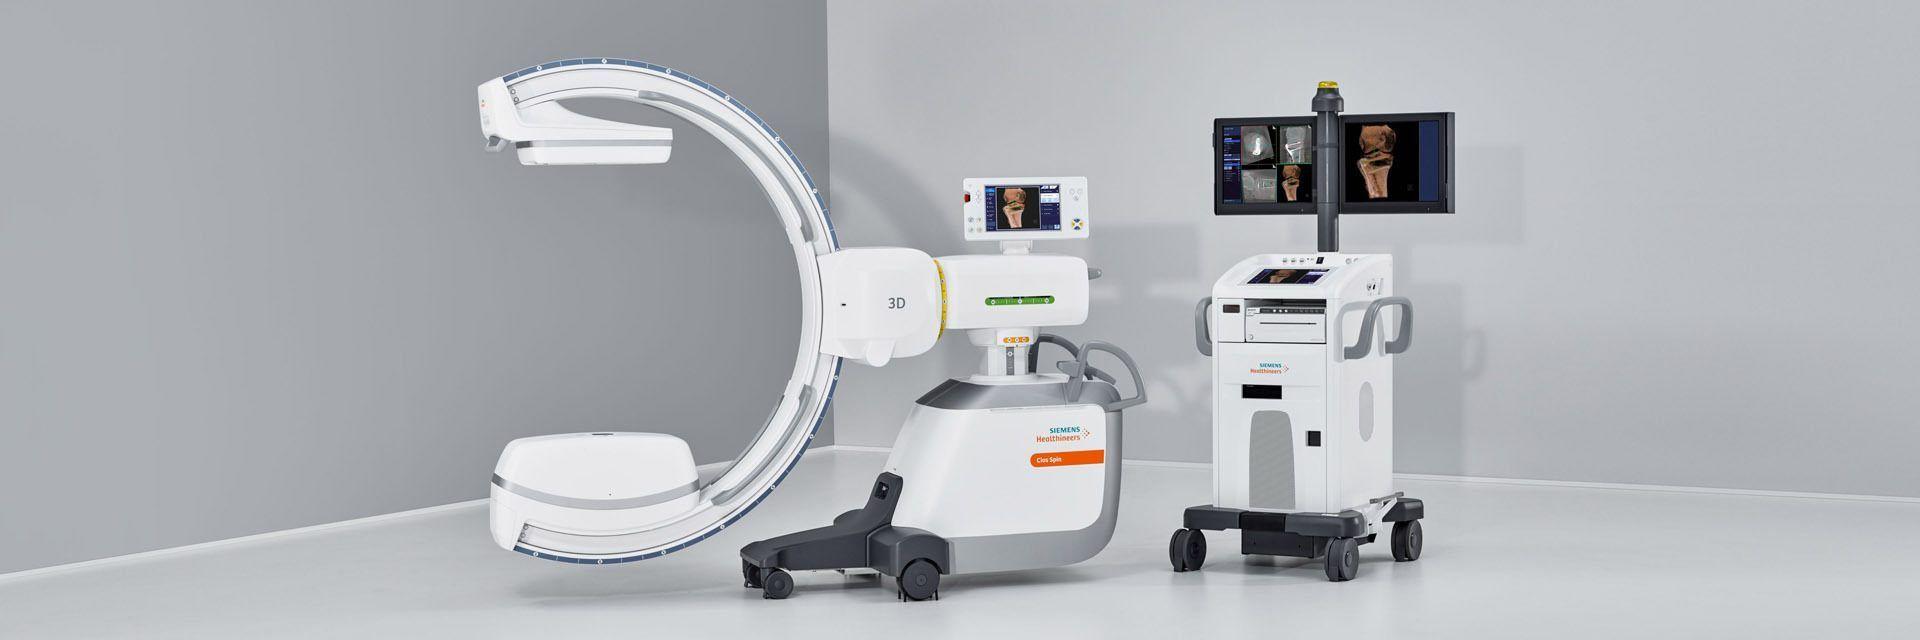 Siemens - Cios Spin Mobile 3D